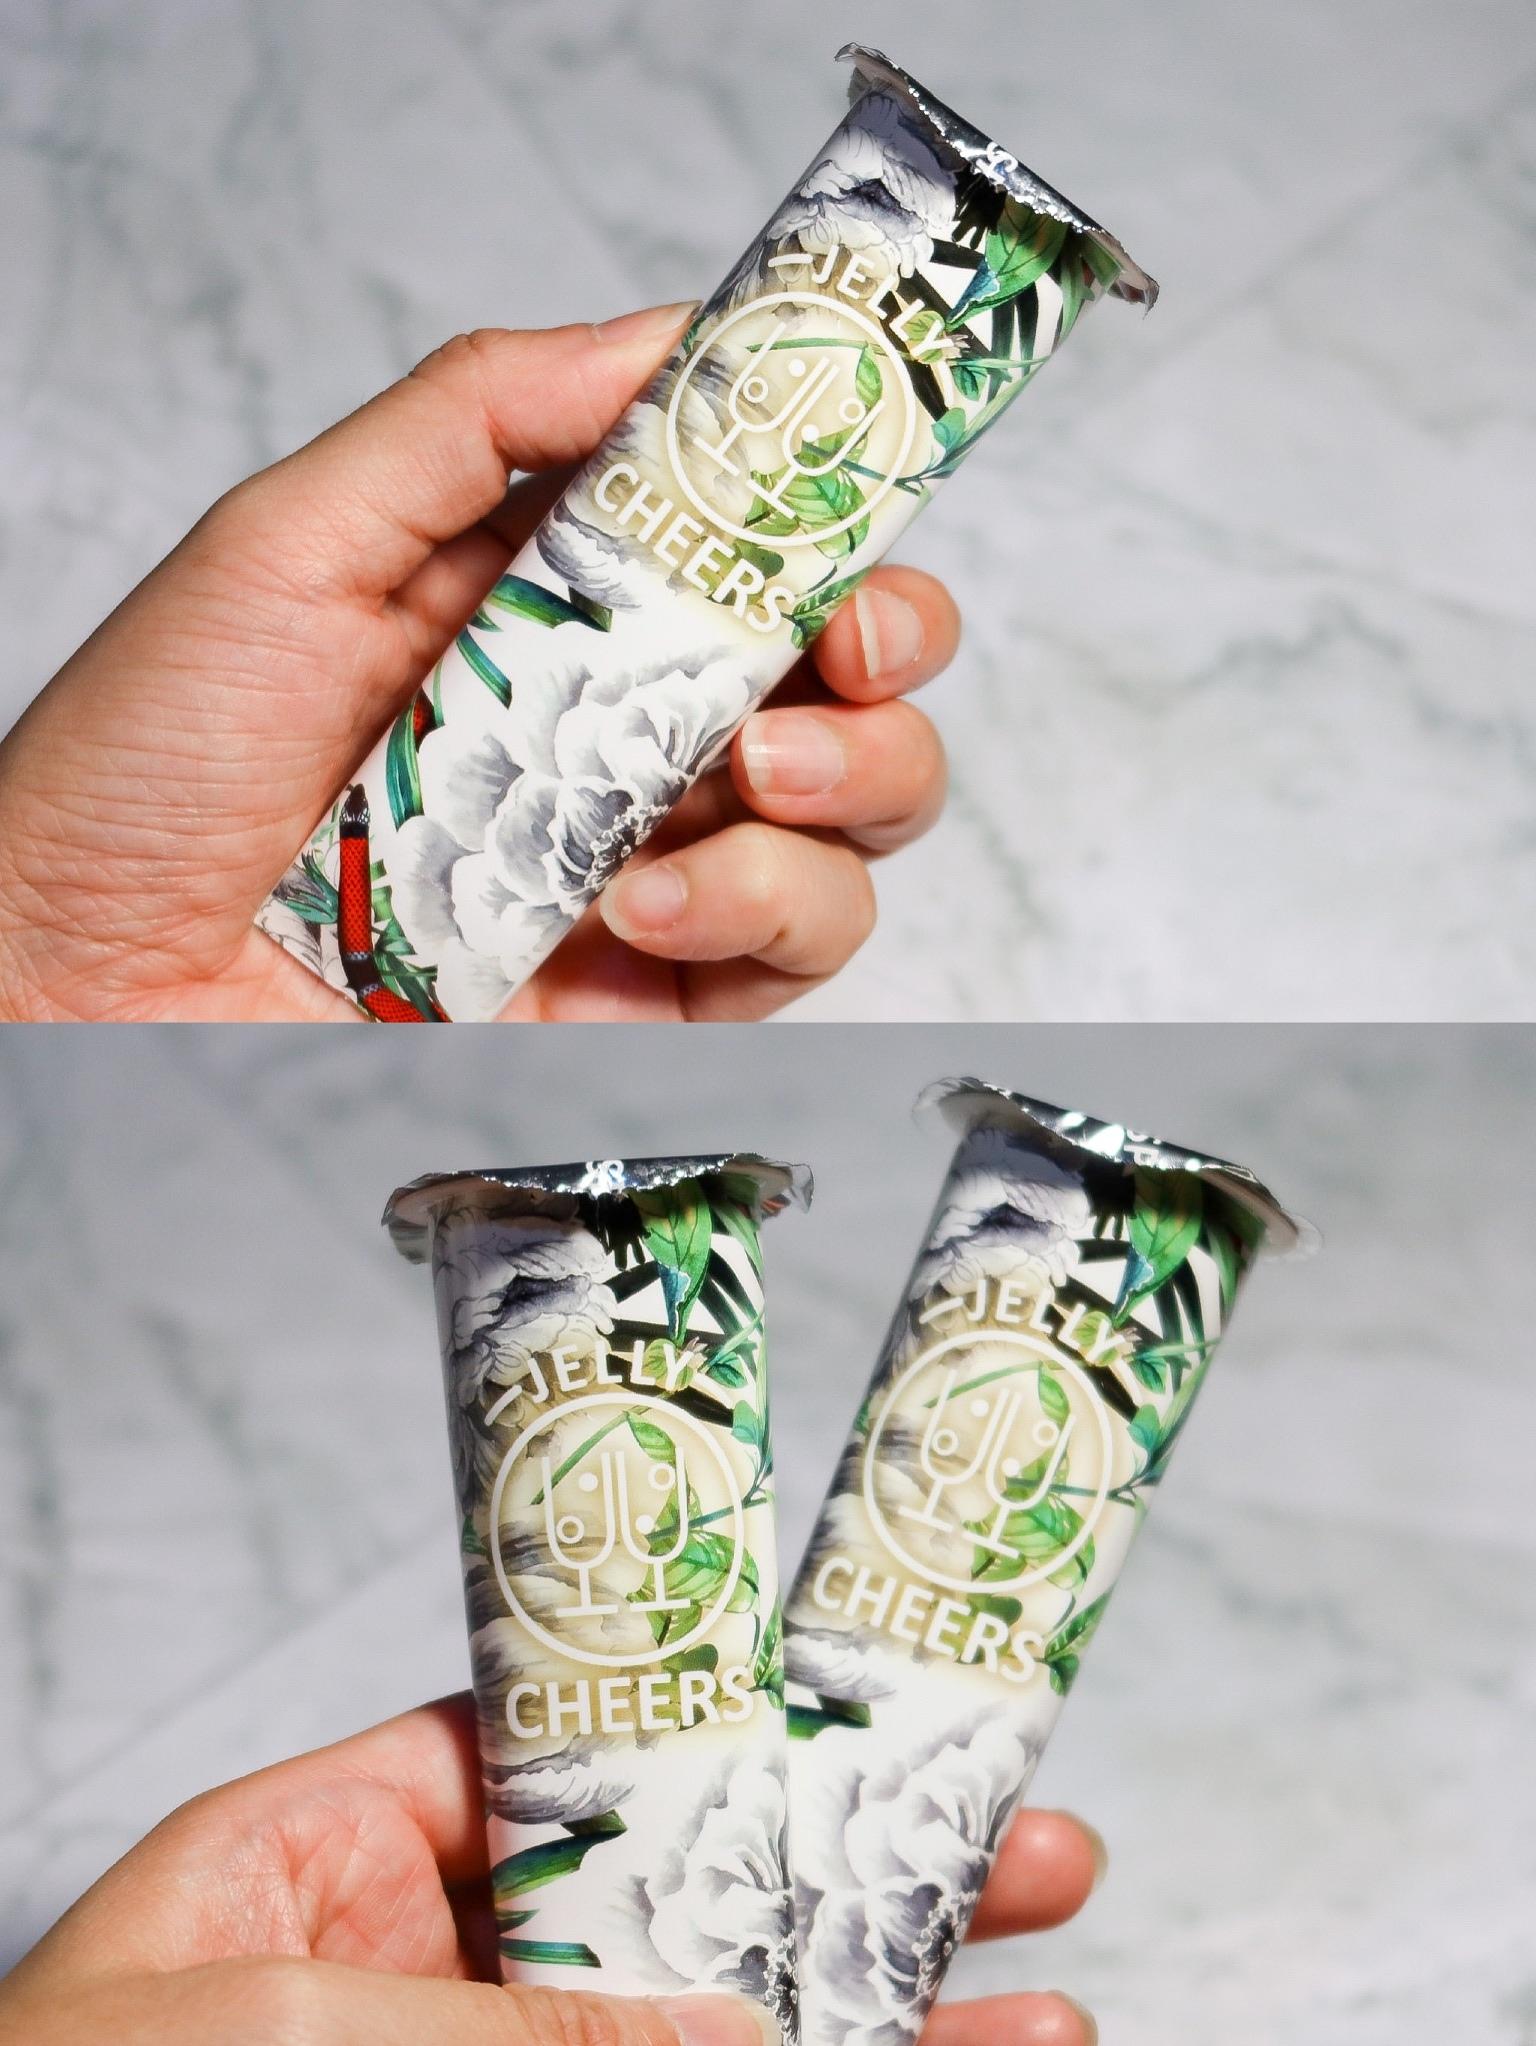 Cheerspops 舉杯低卡水果口味蒟蒻凍